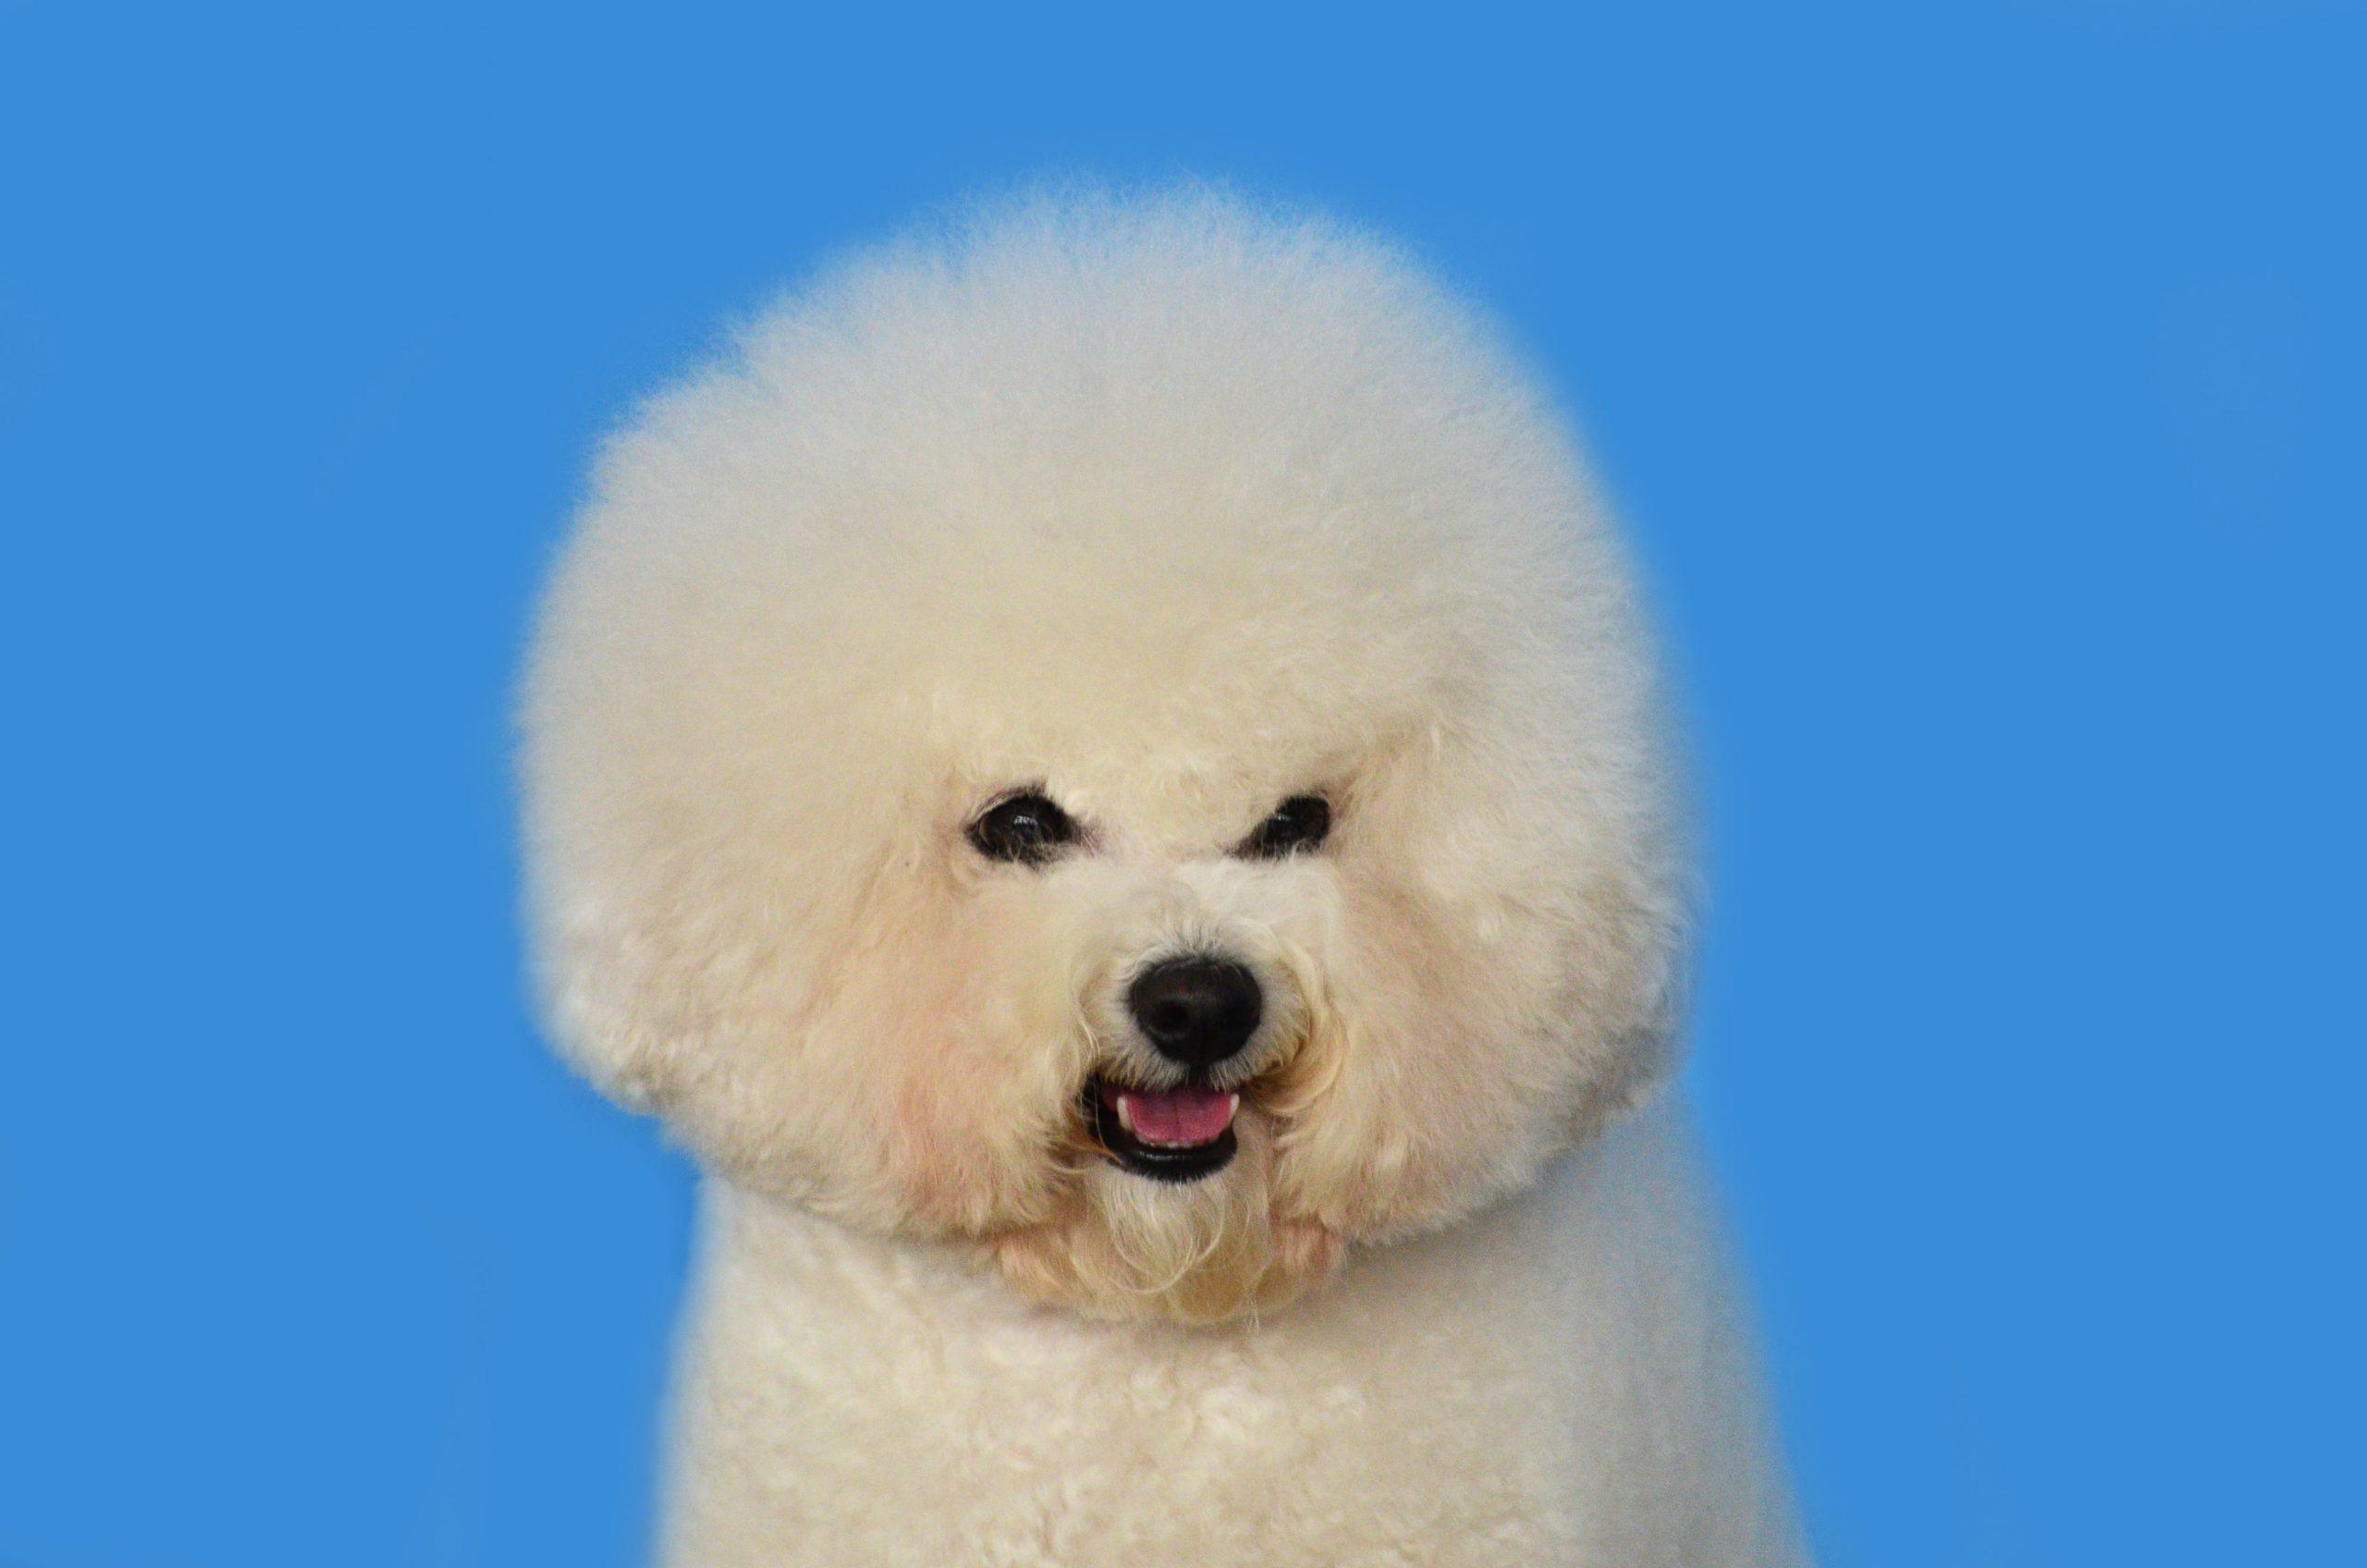 Bichon Frise healthiest dog breed